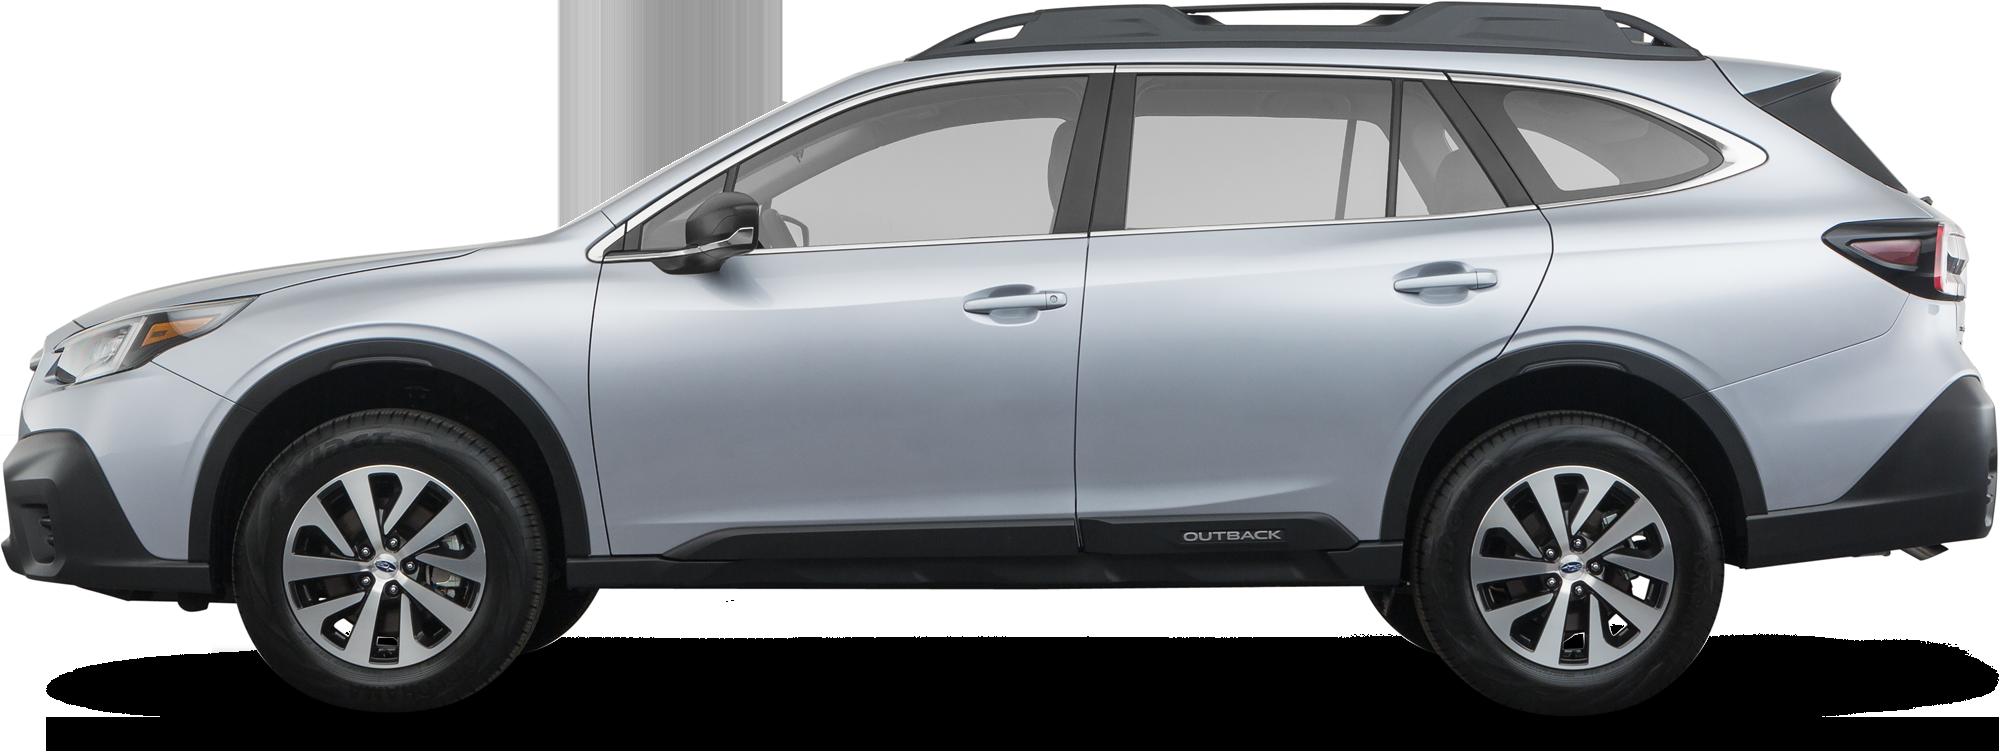 2021 Subaru Outback SUV Base Trim Level